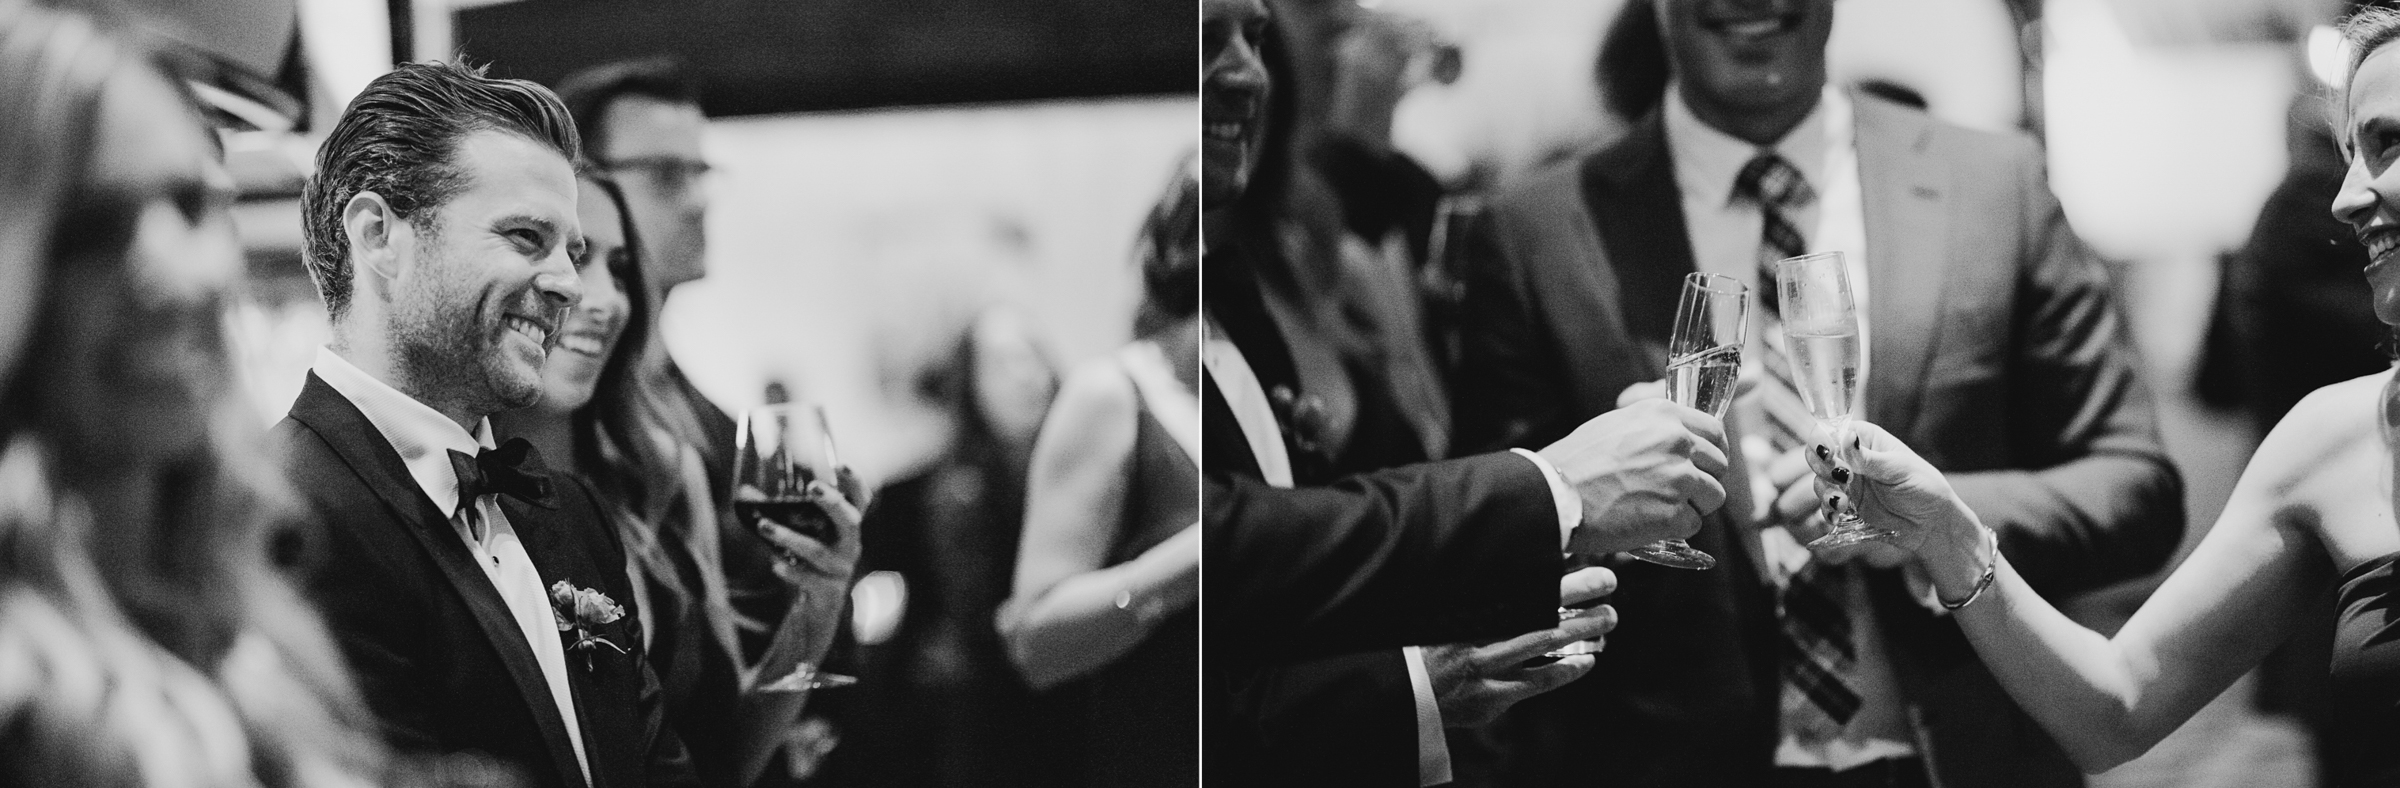 cheers the drake 150 toronto wedding photographer.jpg